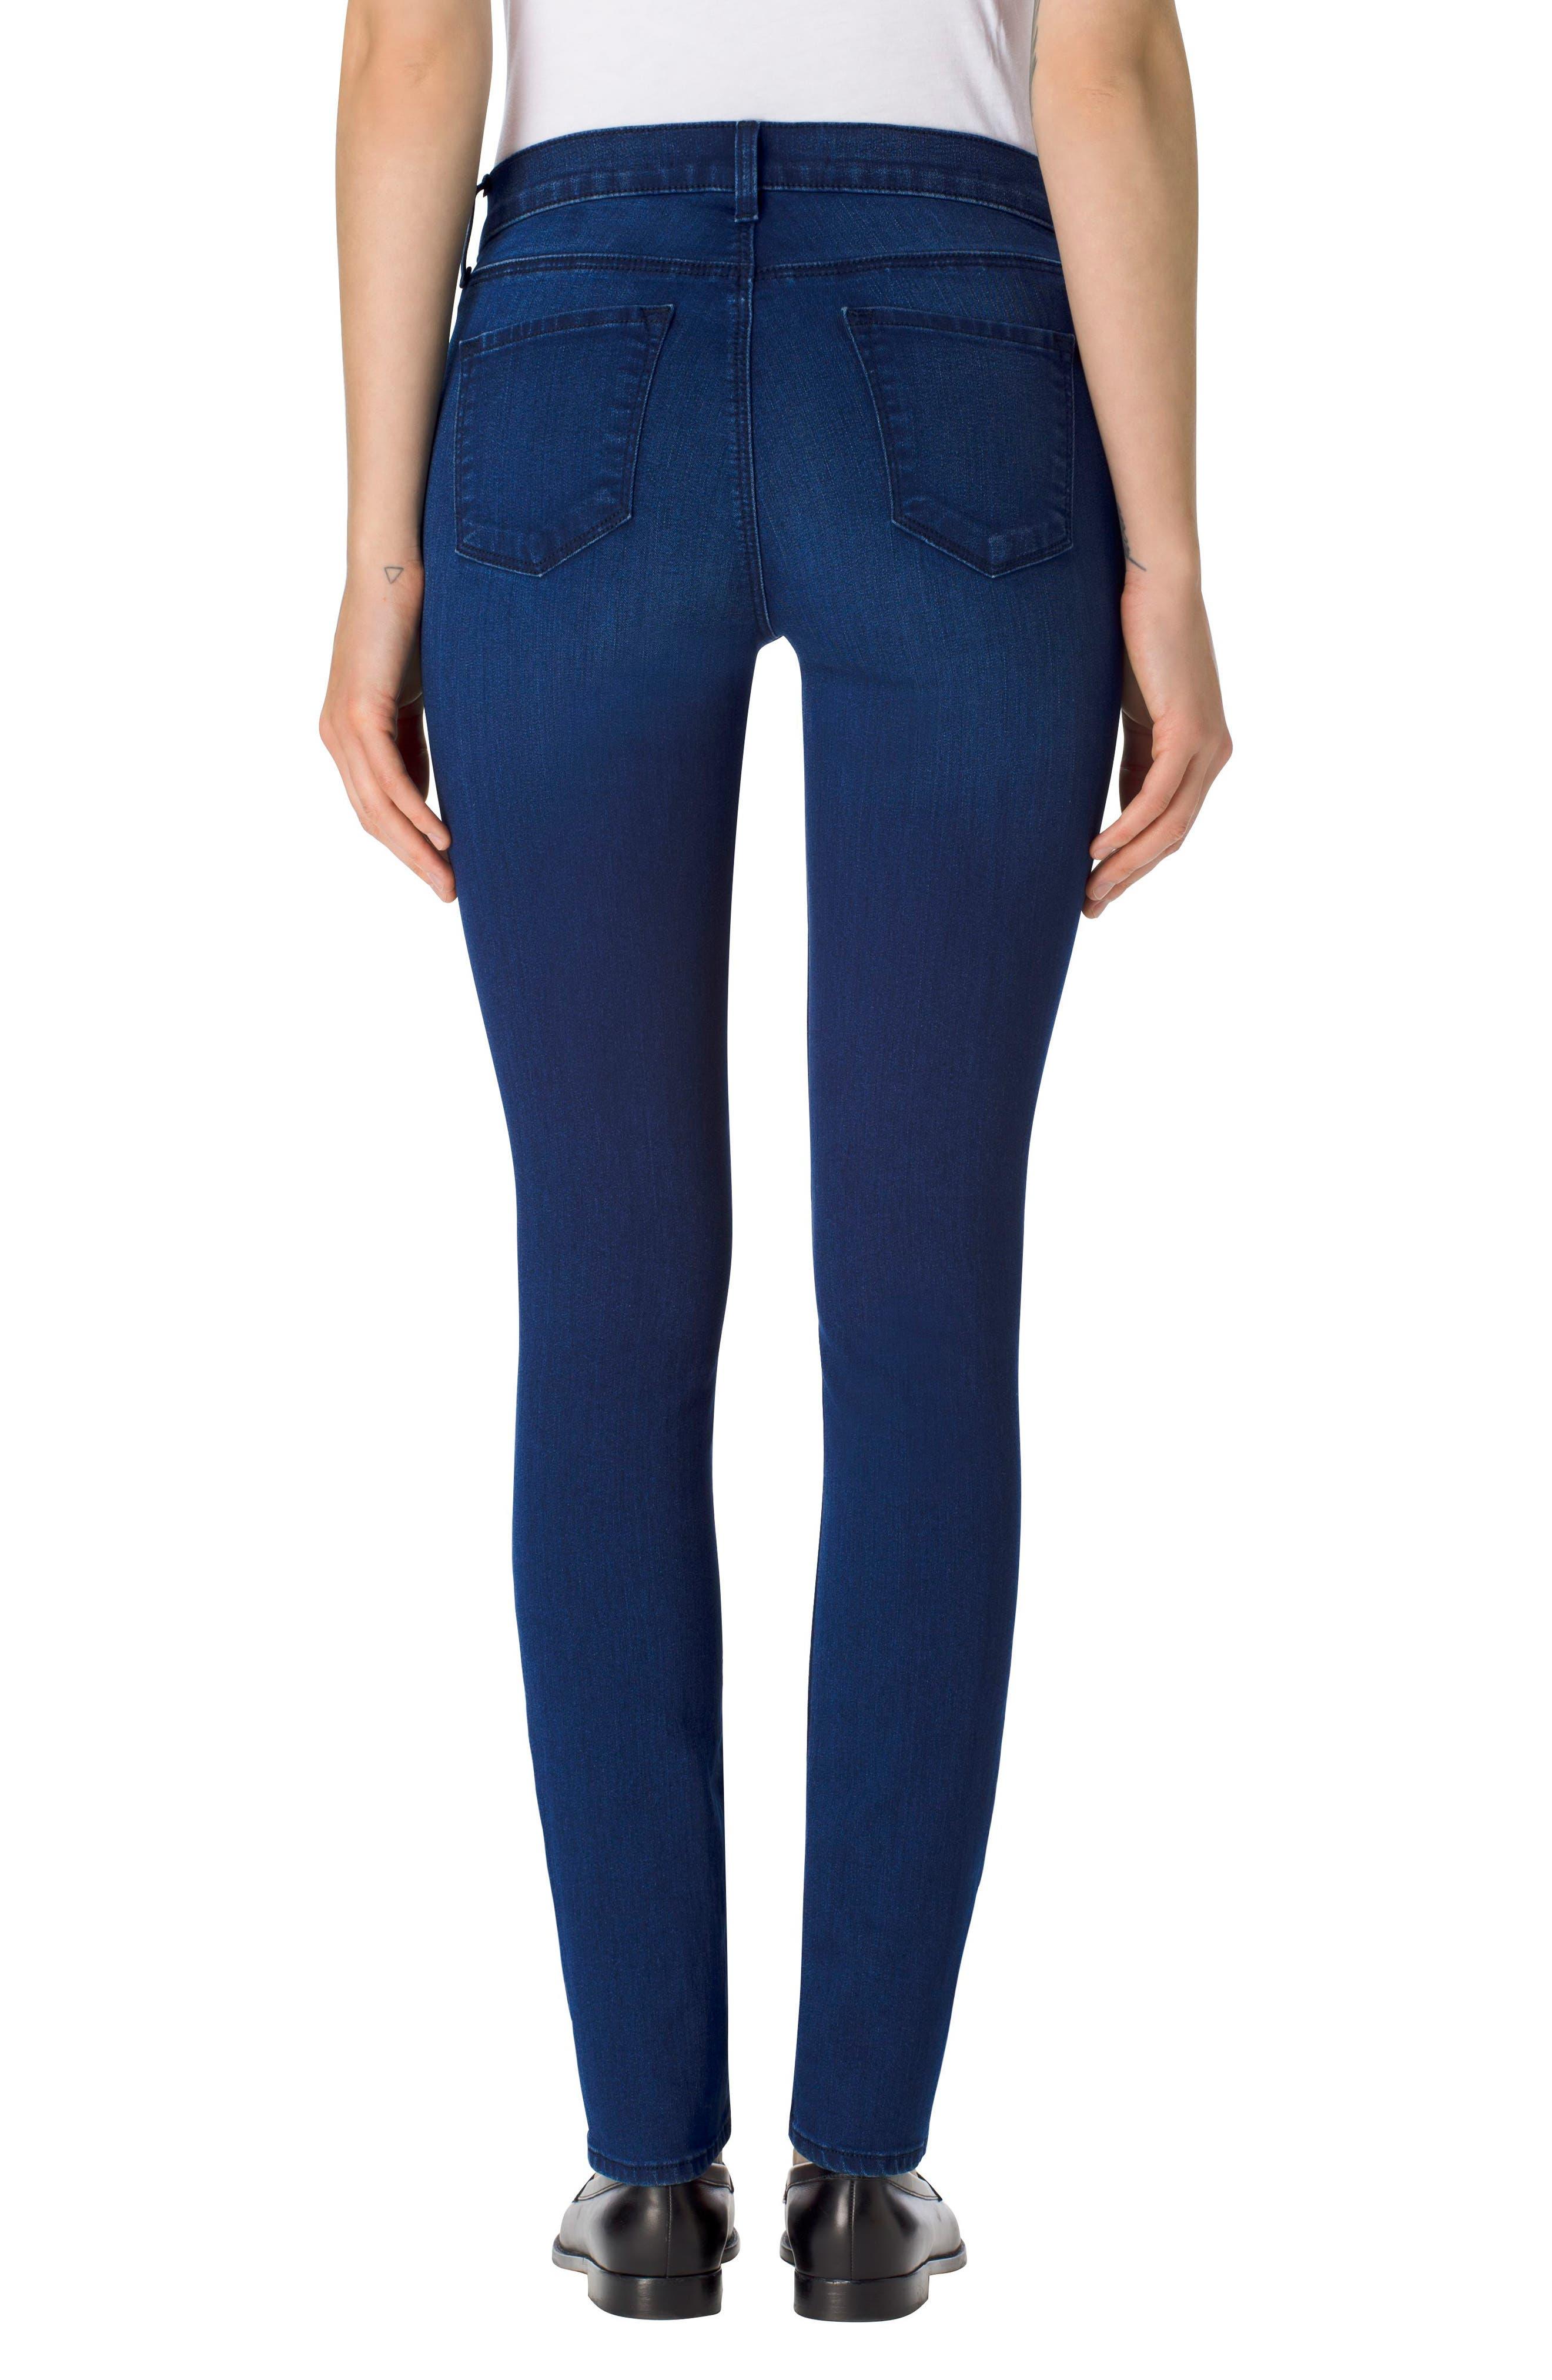 Alternate Image 2  - J Brand '811' Ankle Skinny Jeans (Sway)